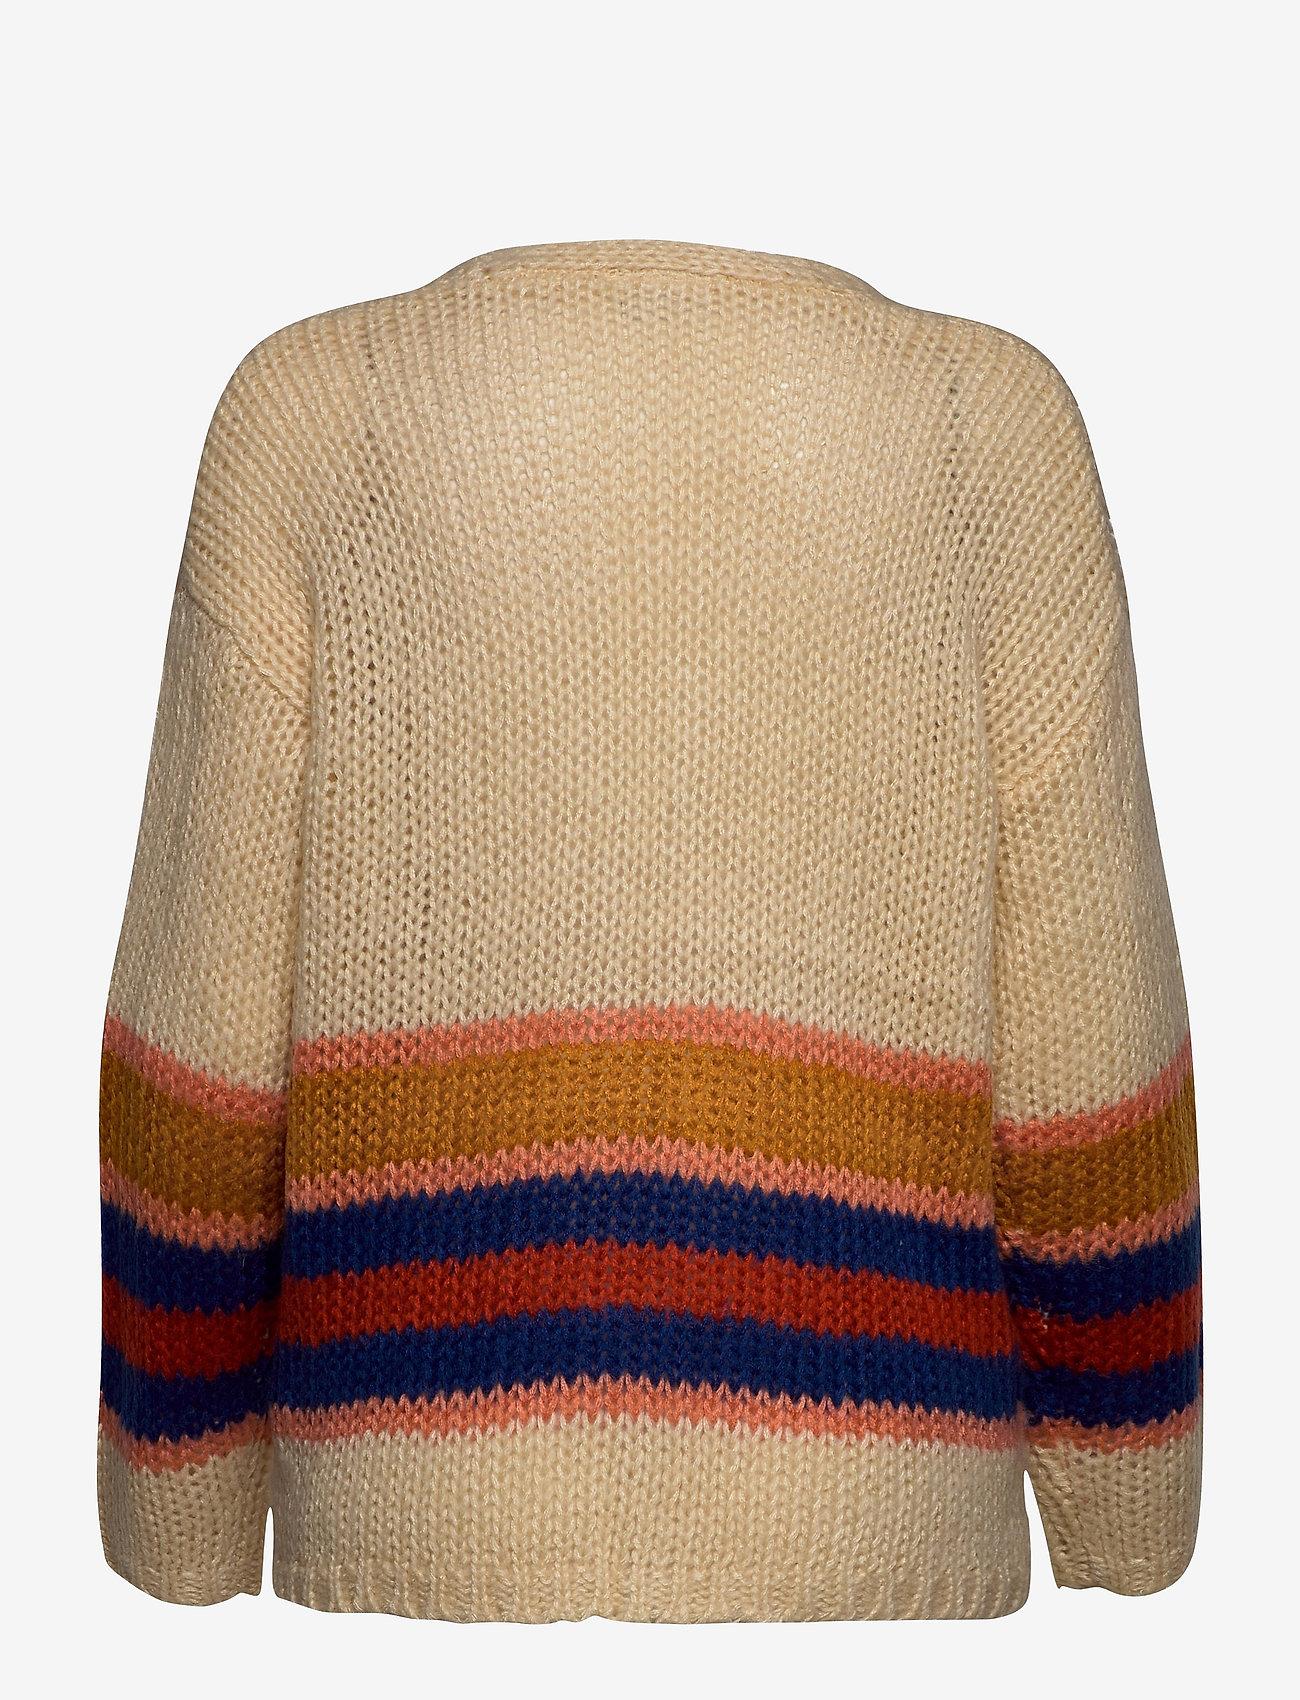 Kamerle Knit Cardigan (Tapioca) (38.47 €) - Kaffe 2UCuS